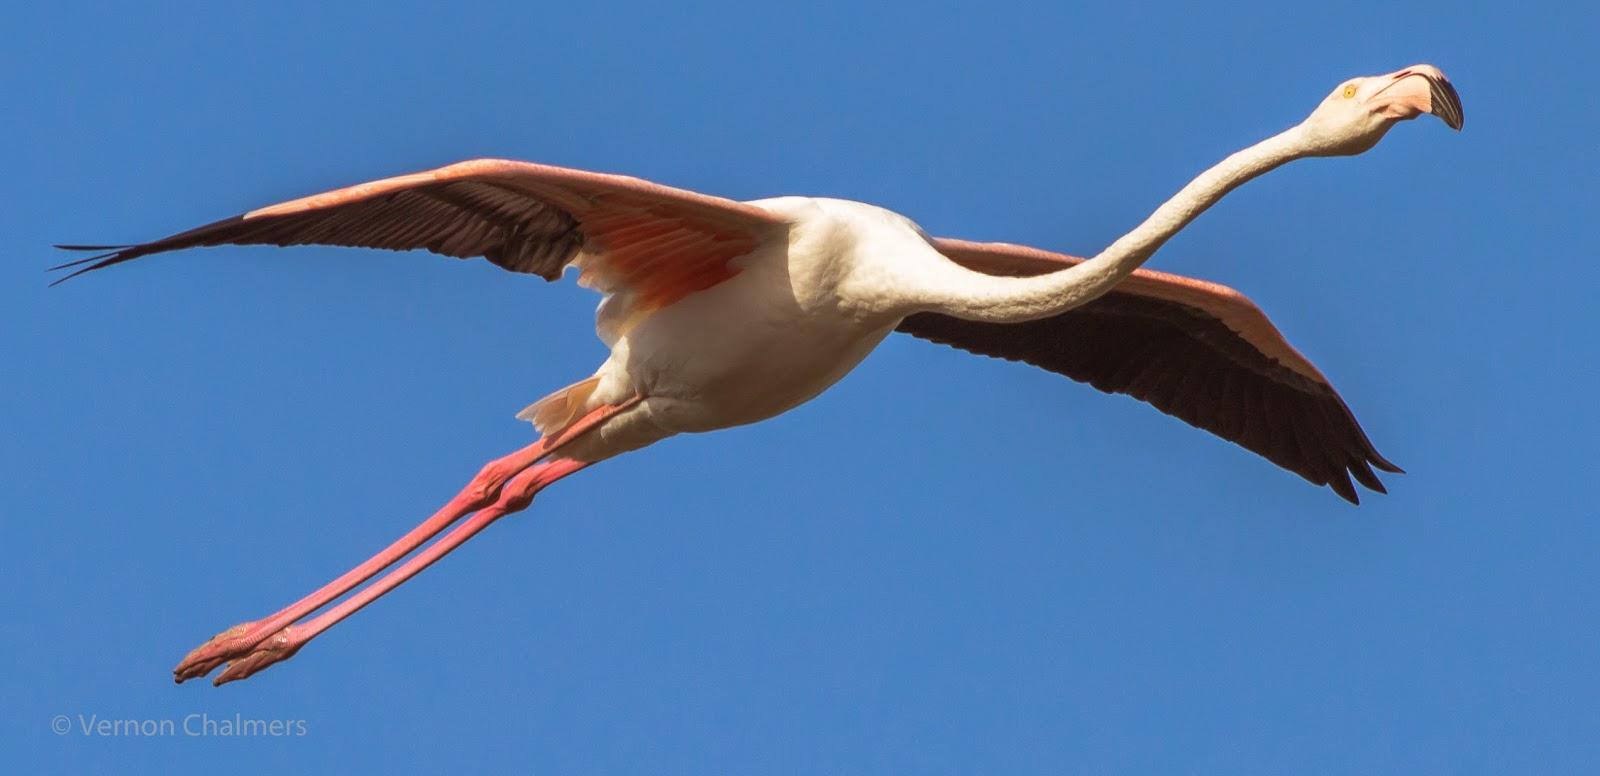 Birds In Flight Woodbridge Island with Canon EF 400mm f5.6L USM Lens